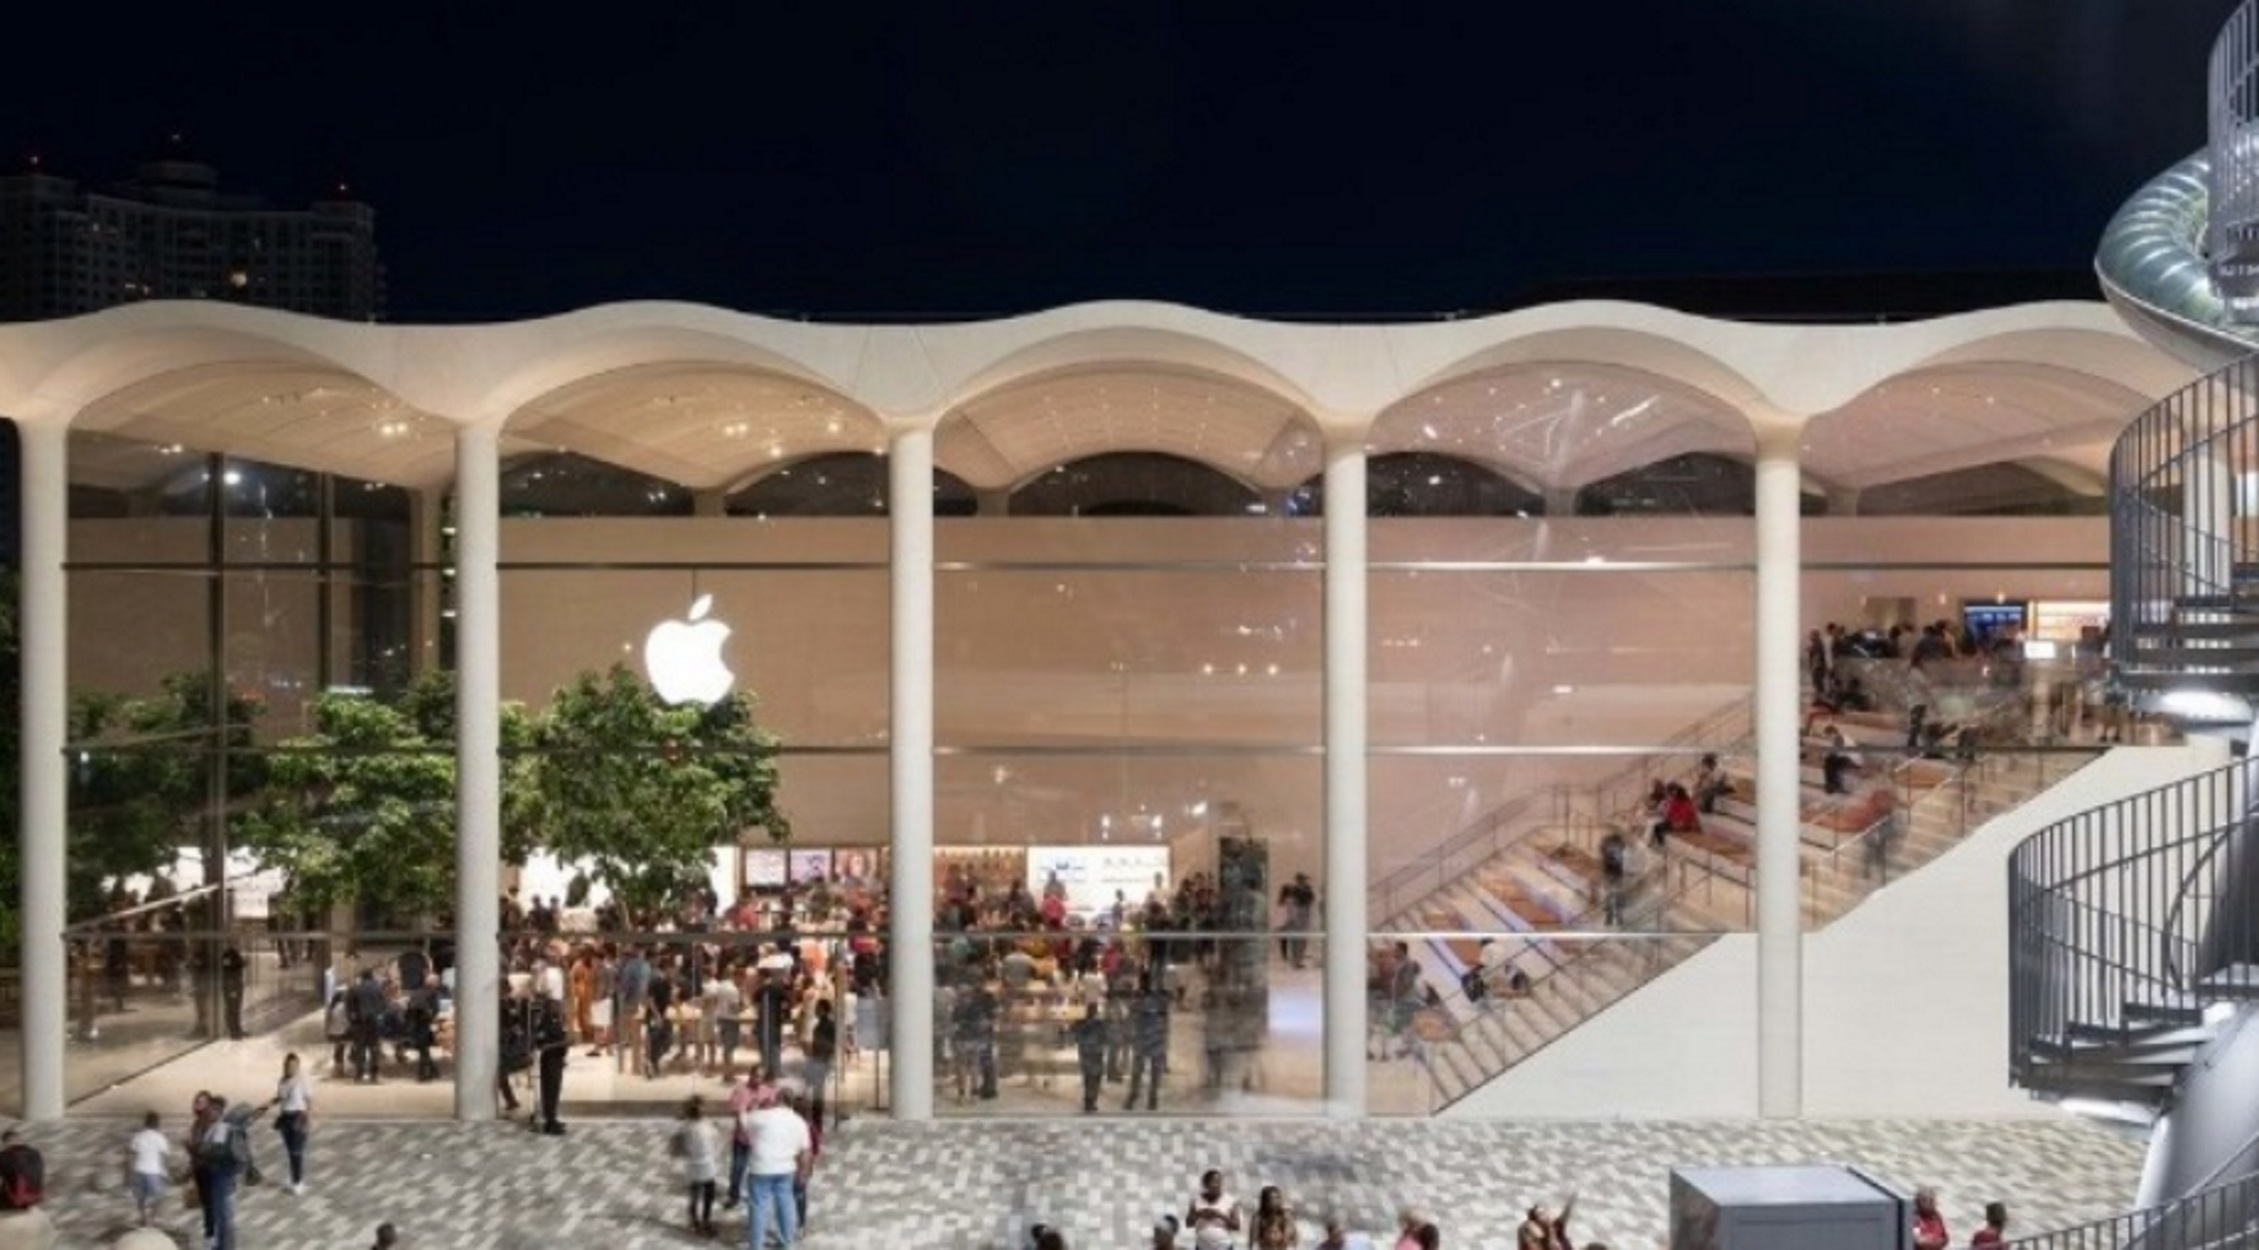 Apple Aventura: Το νέο εντυπωσιακό πολυκατάστημα της εταιρείας στο Μαϊάμι – video